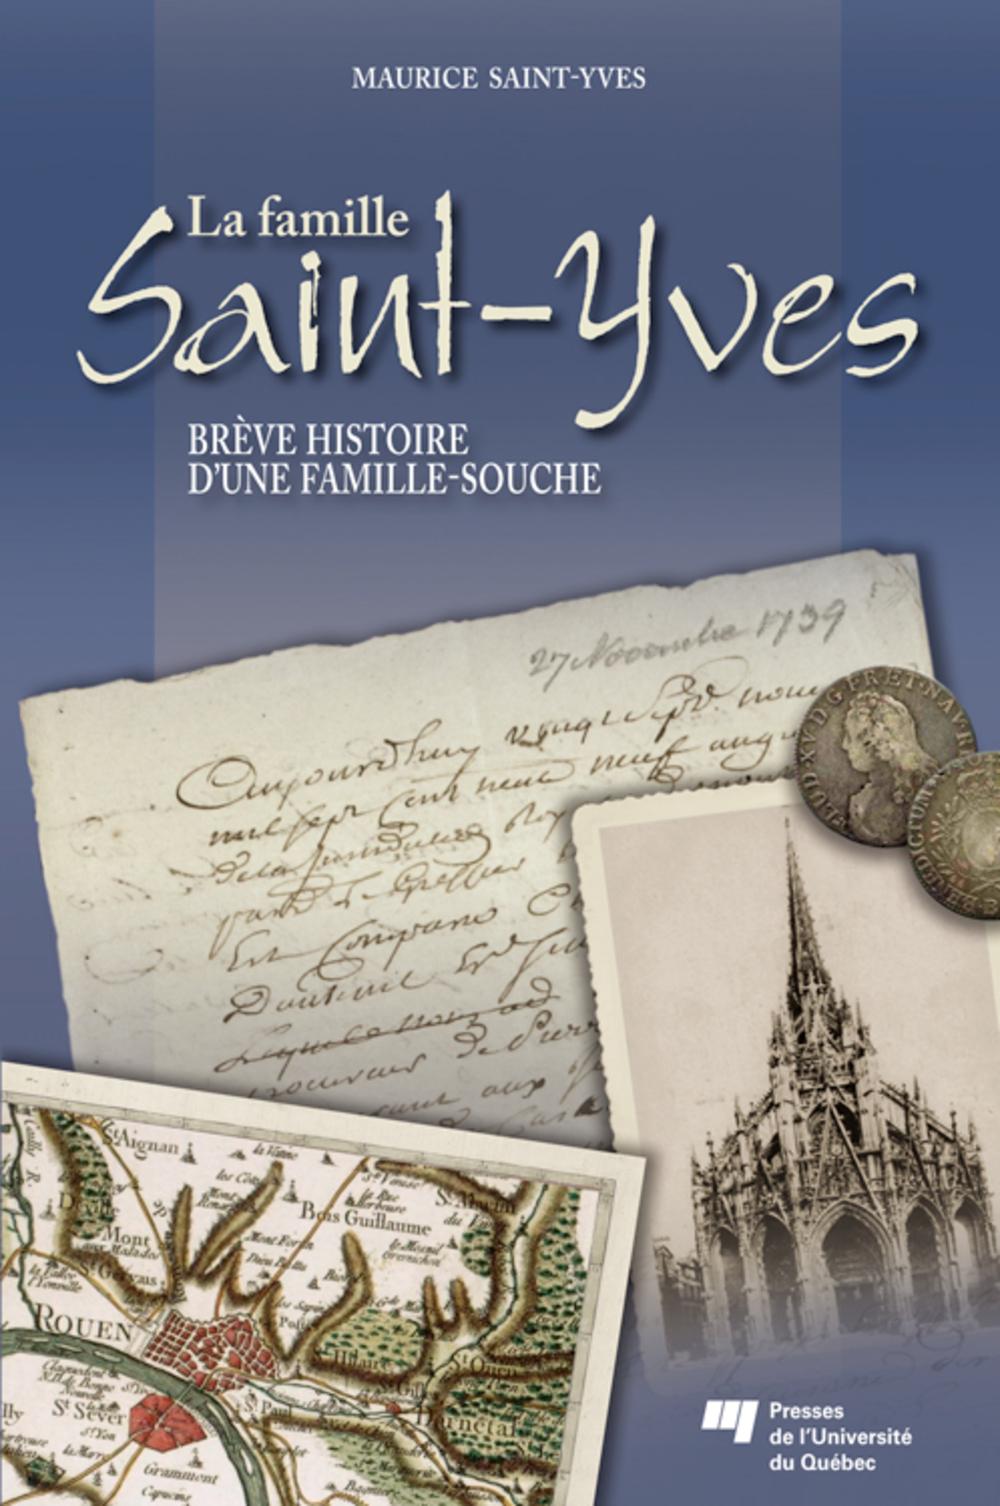 La famille Saint-Yves